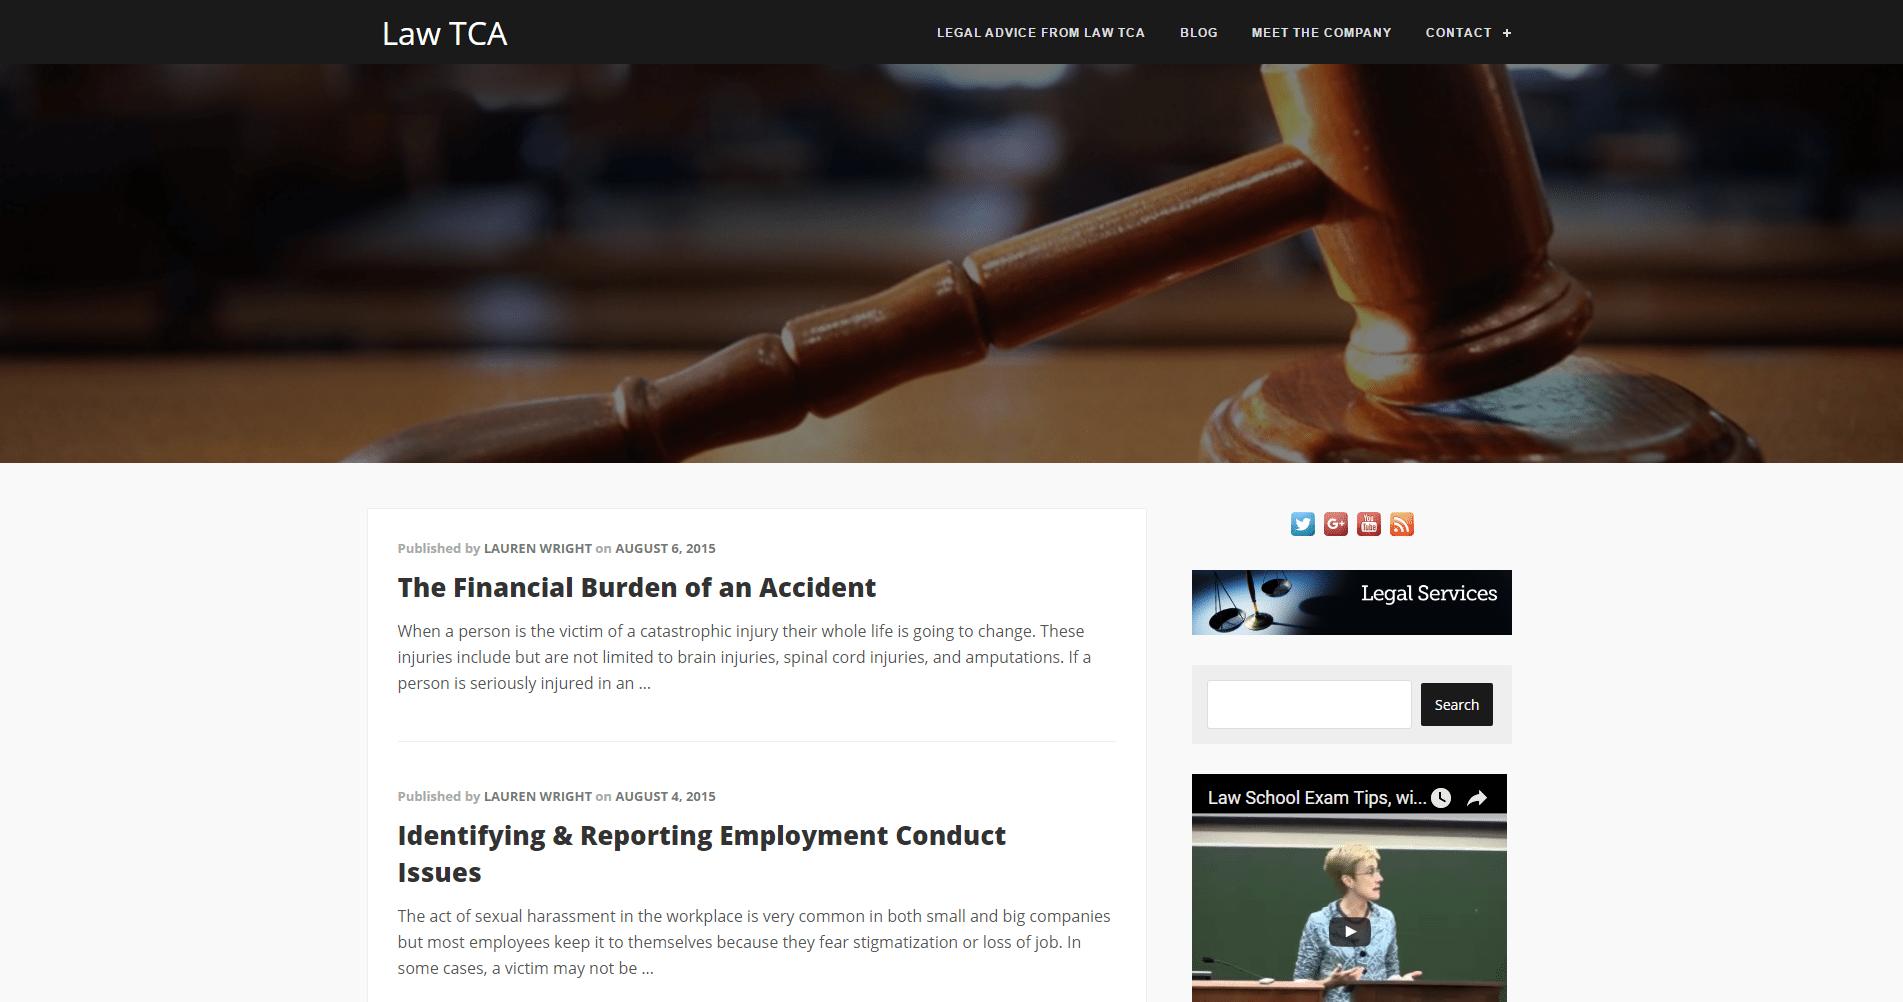 Law TCA